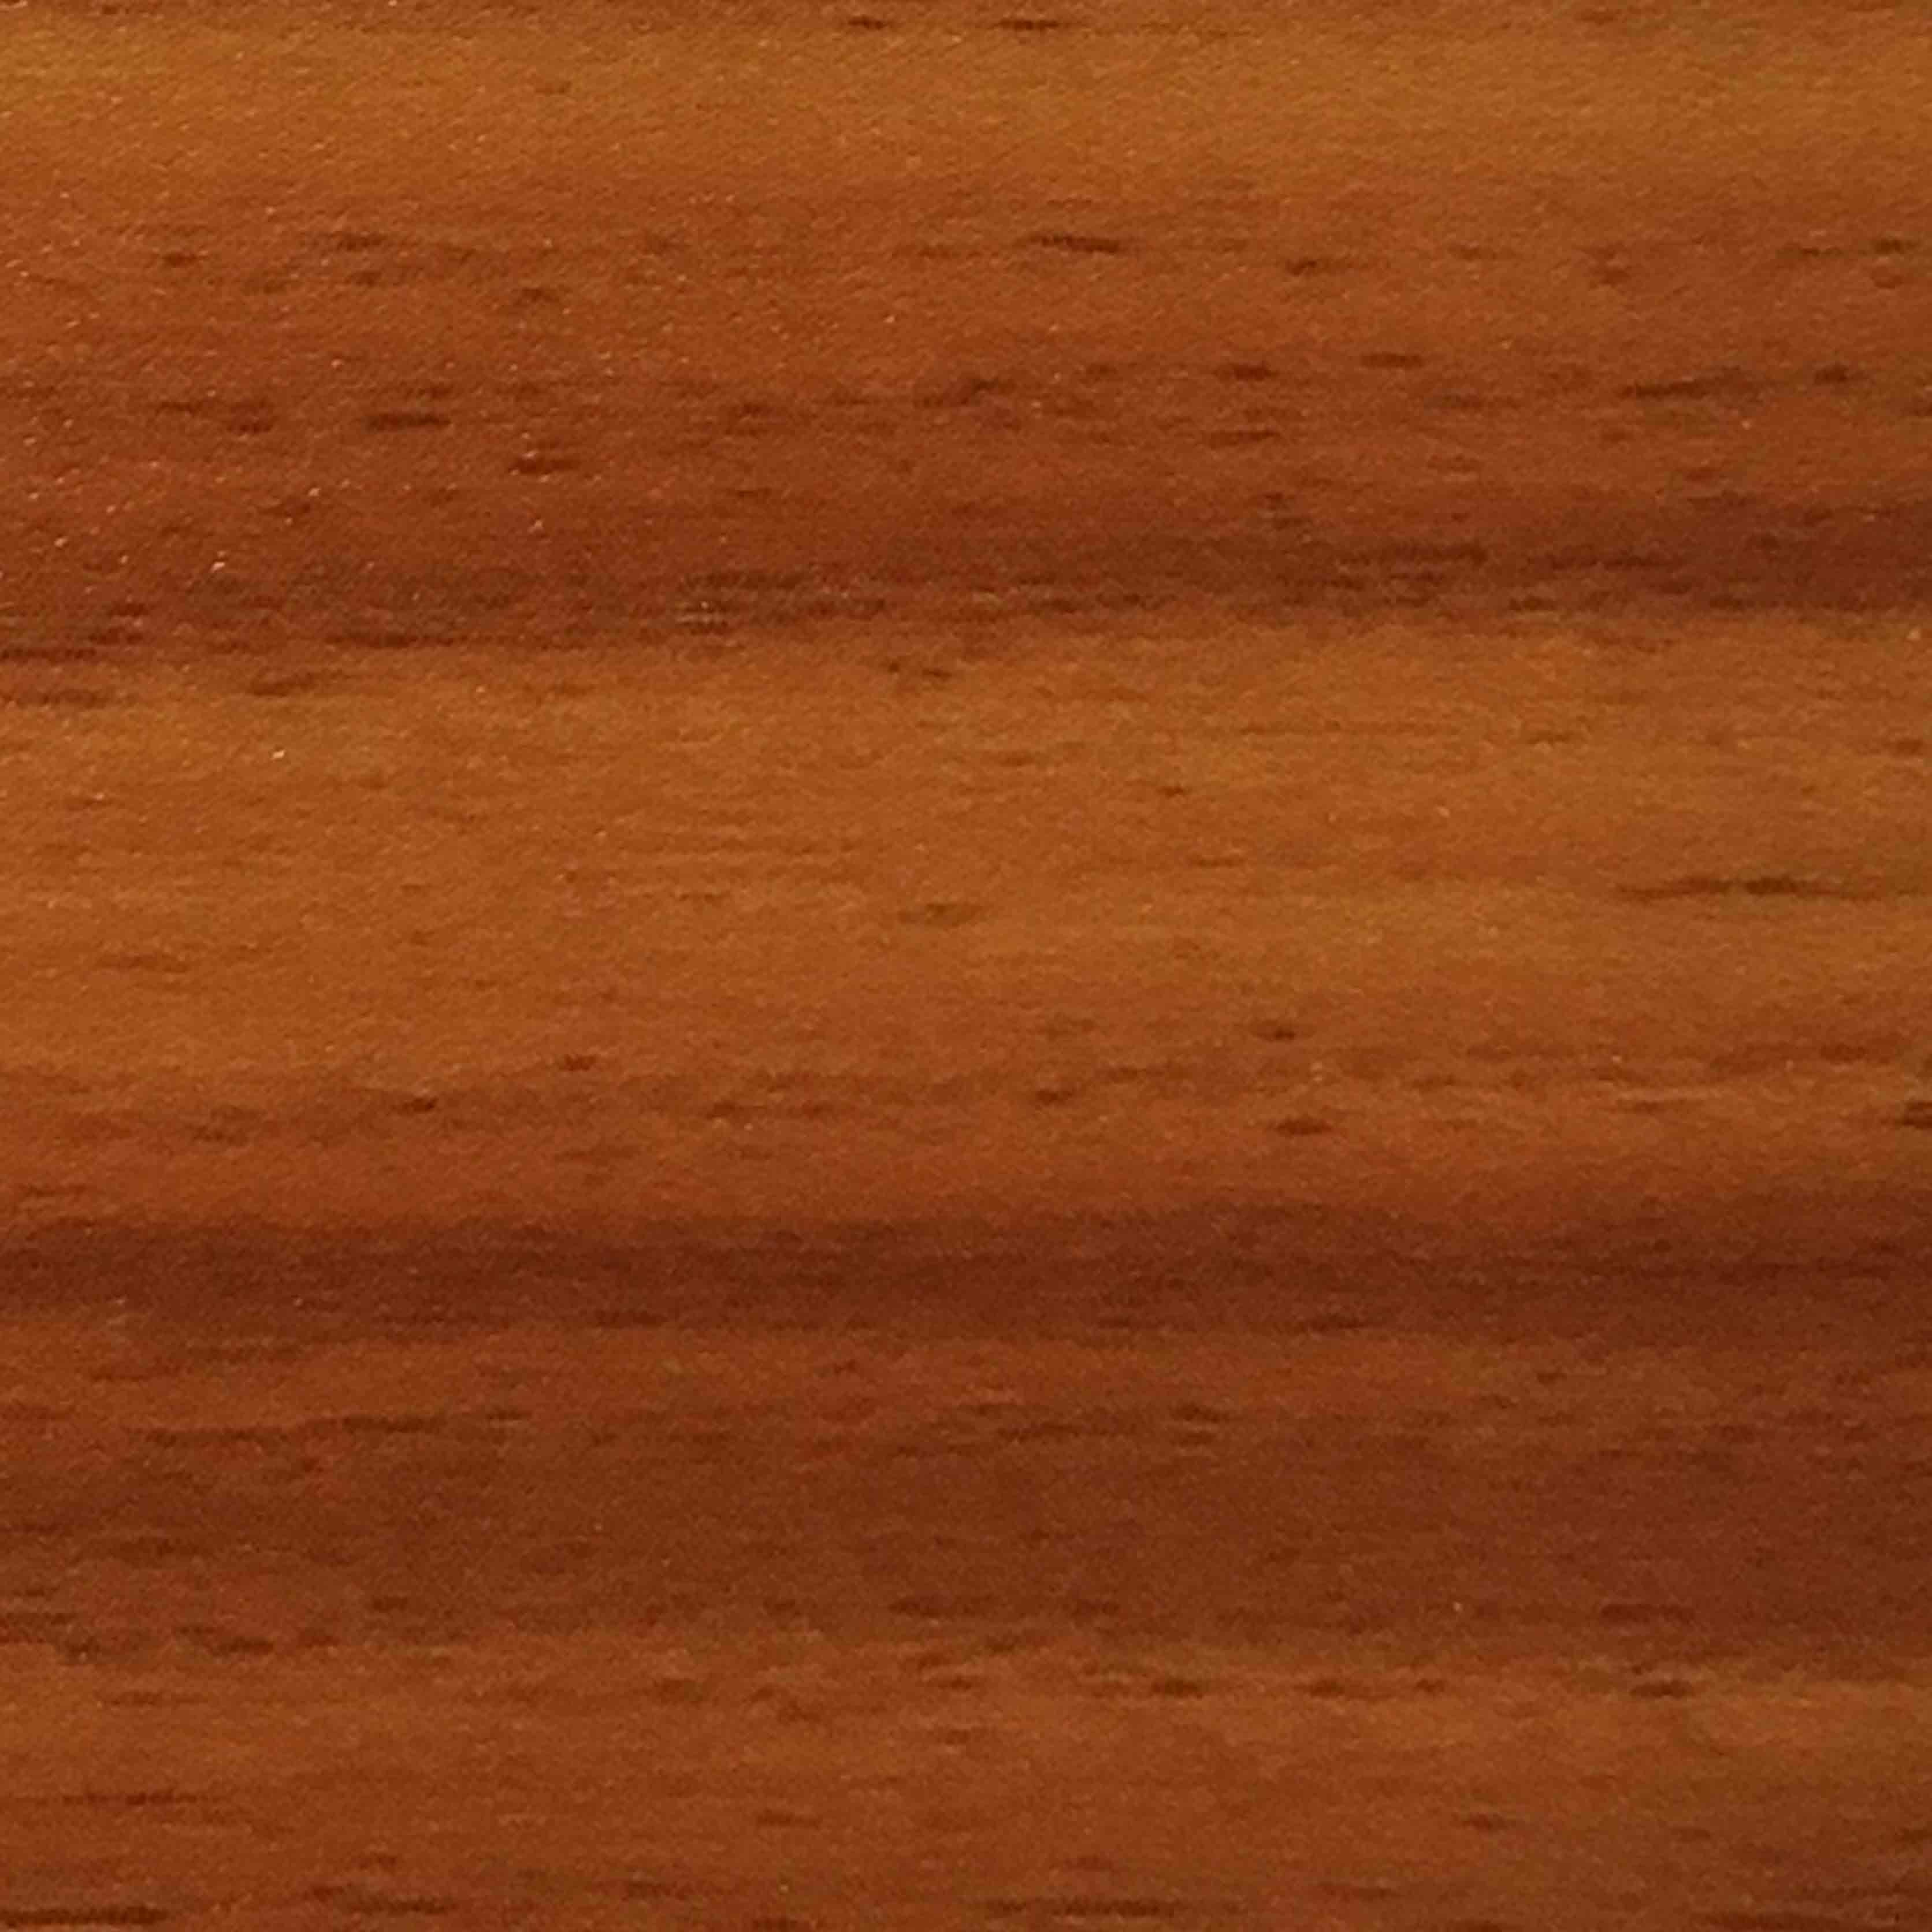 Decal vân gỗ - 3783-33